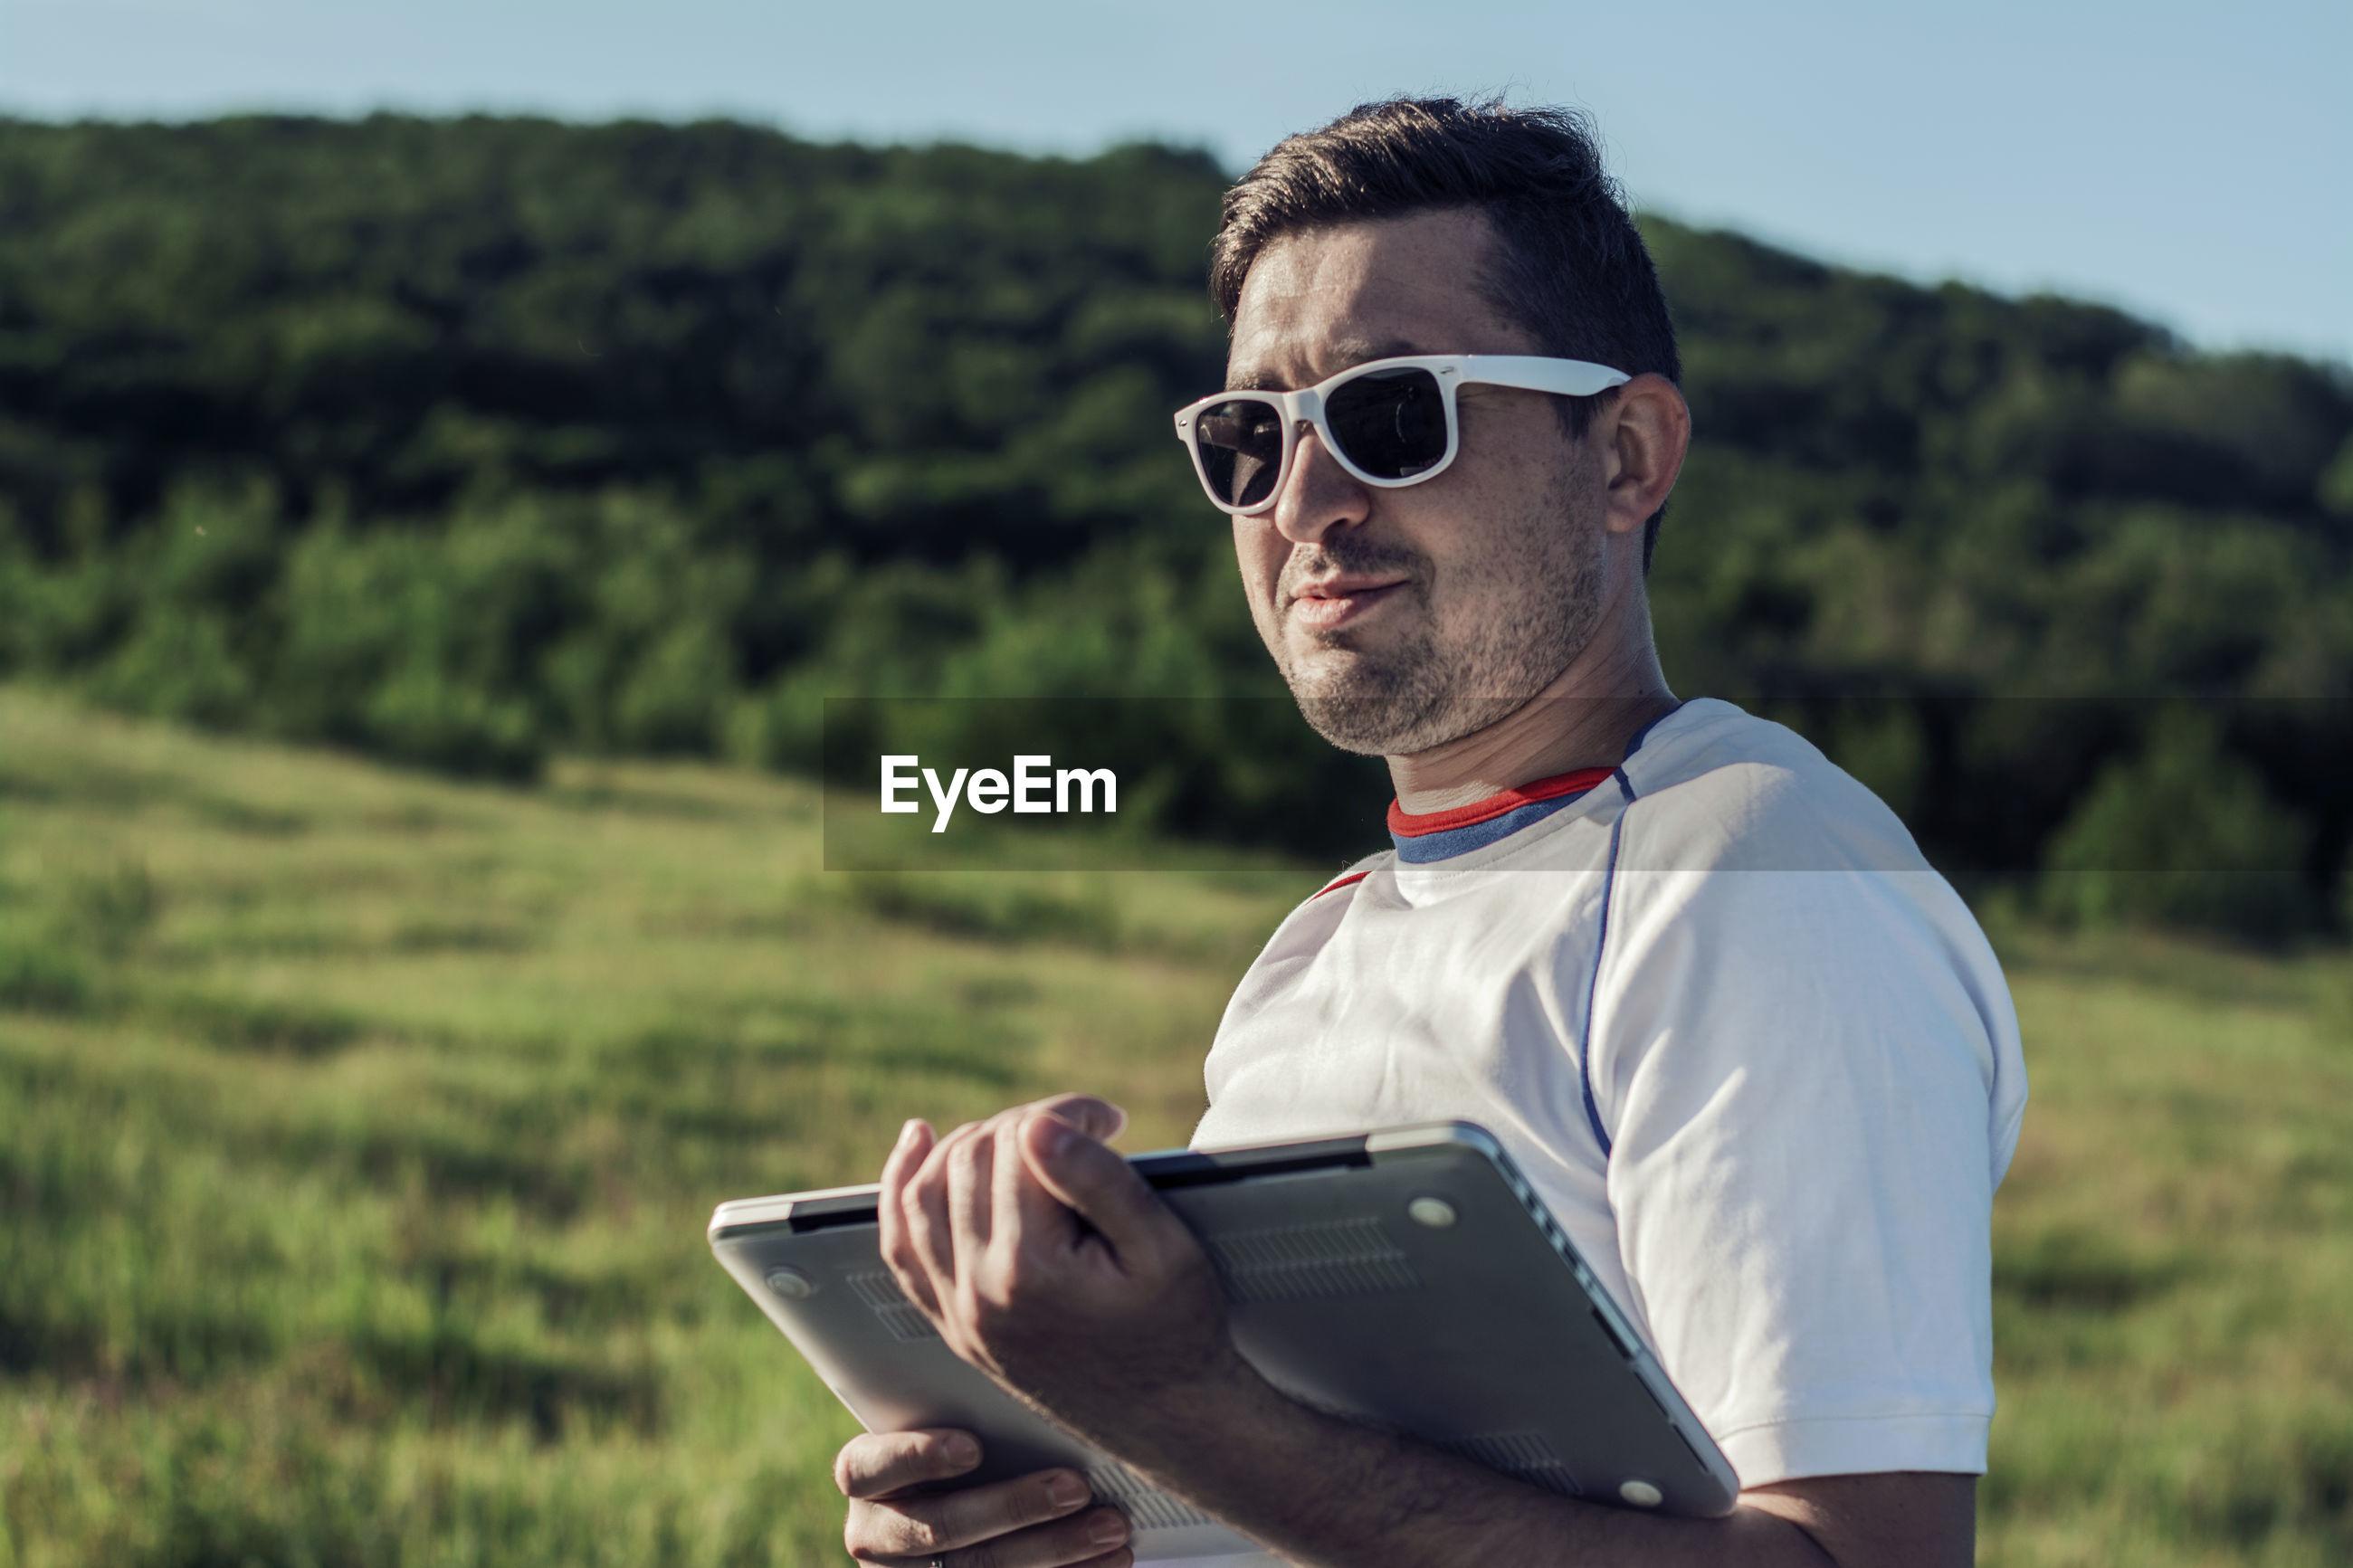 Man holding laptop on field